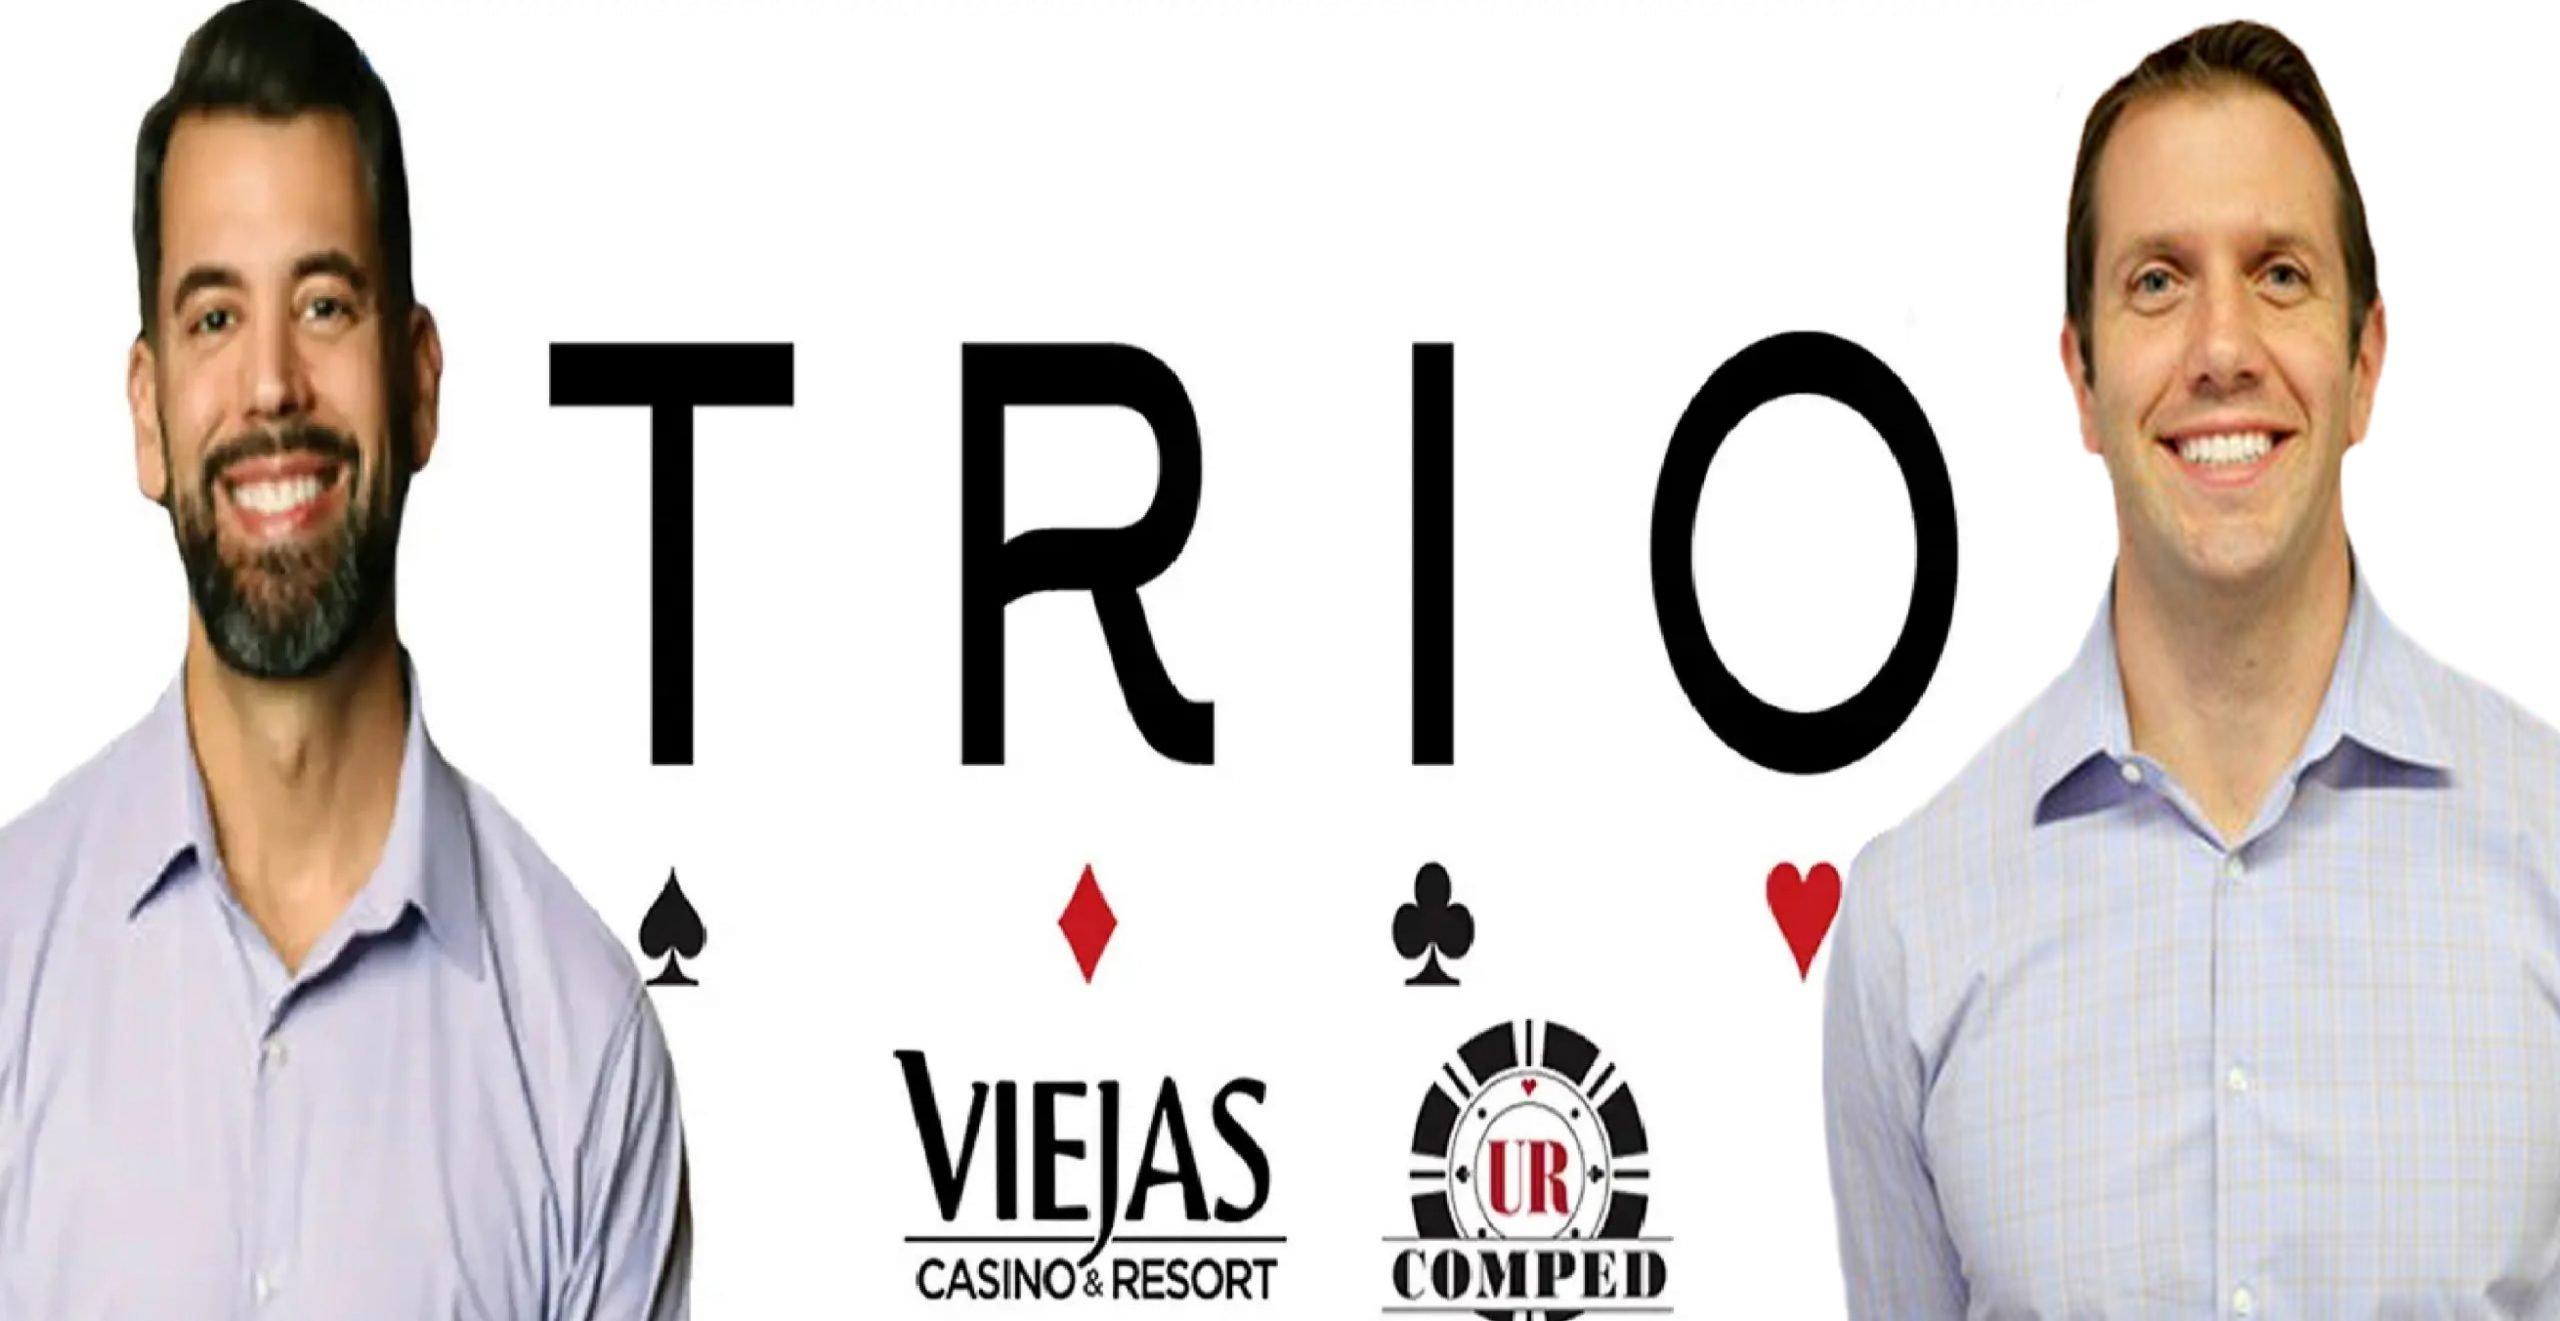 TRIO Testimonial: Michael Spellman- Casino Host, Viejas Casino & Resort